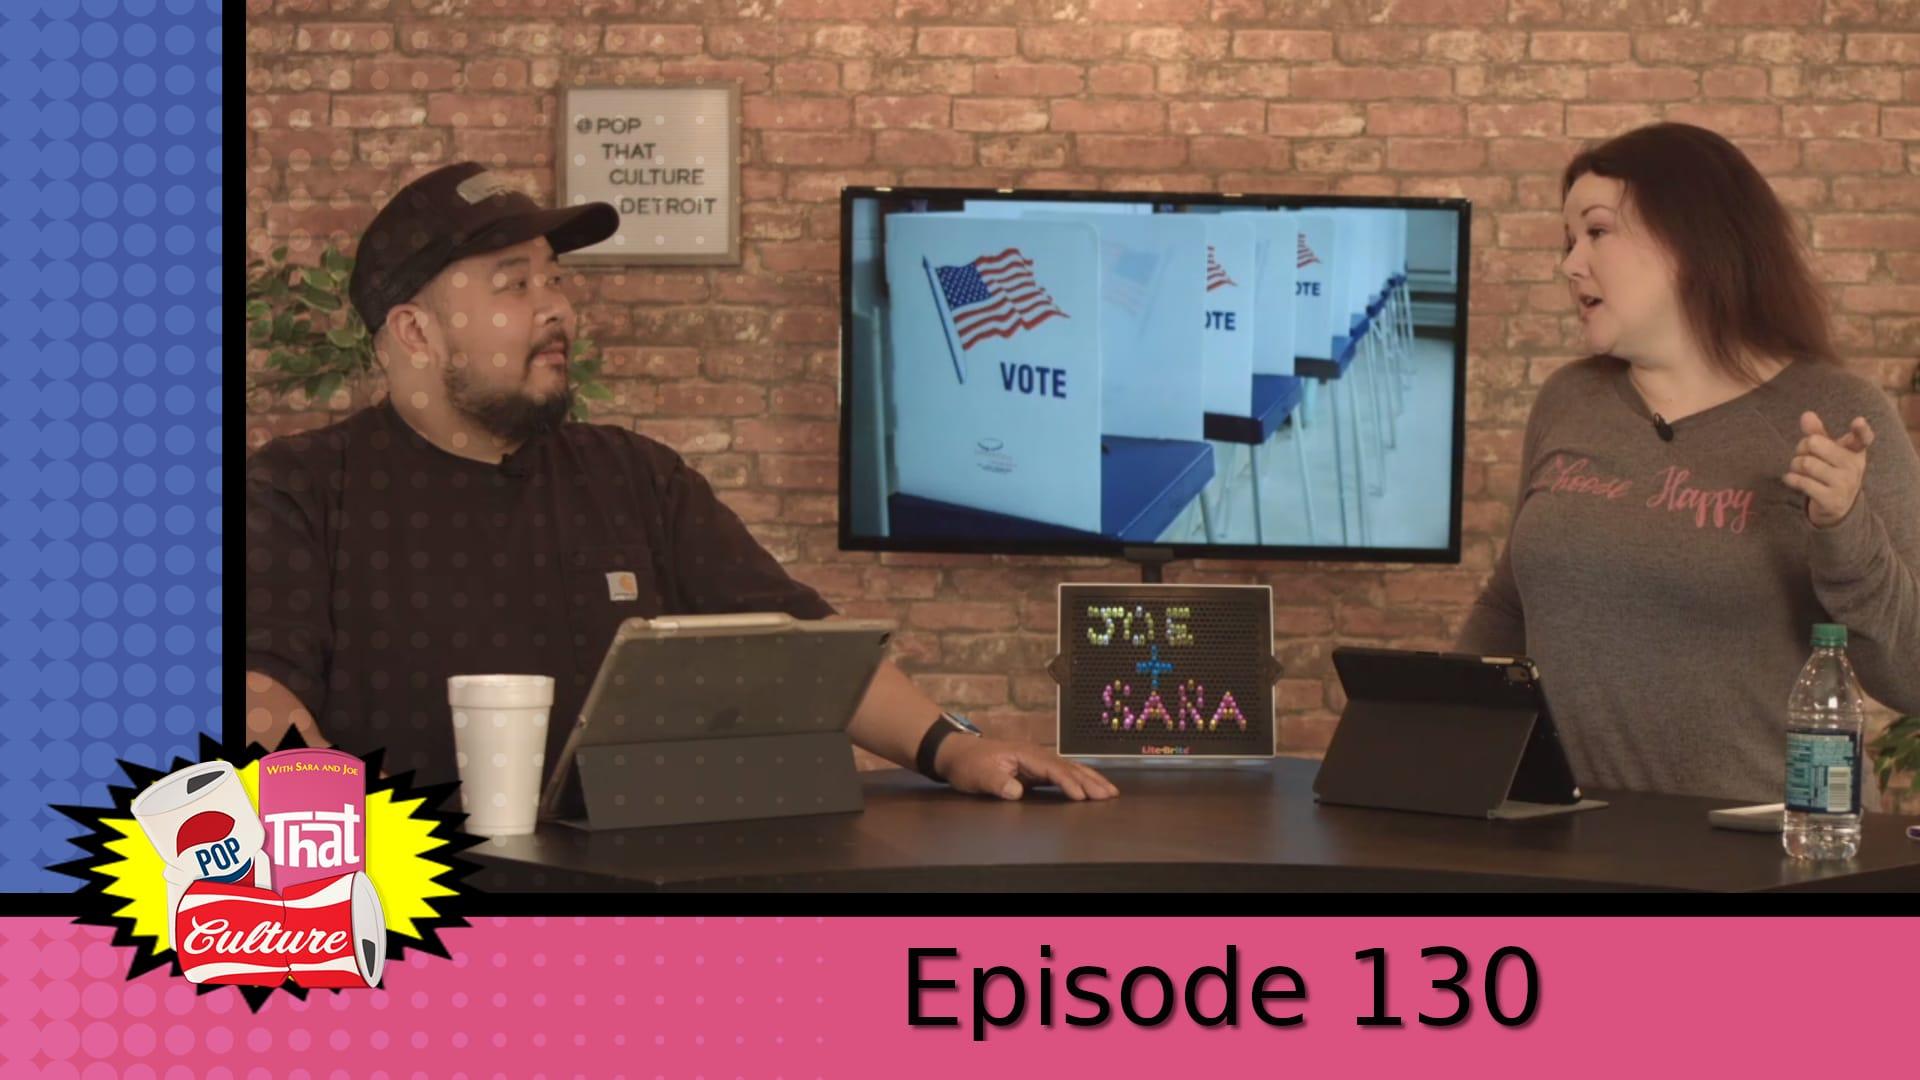 Pop That Culture - Episode 130